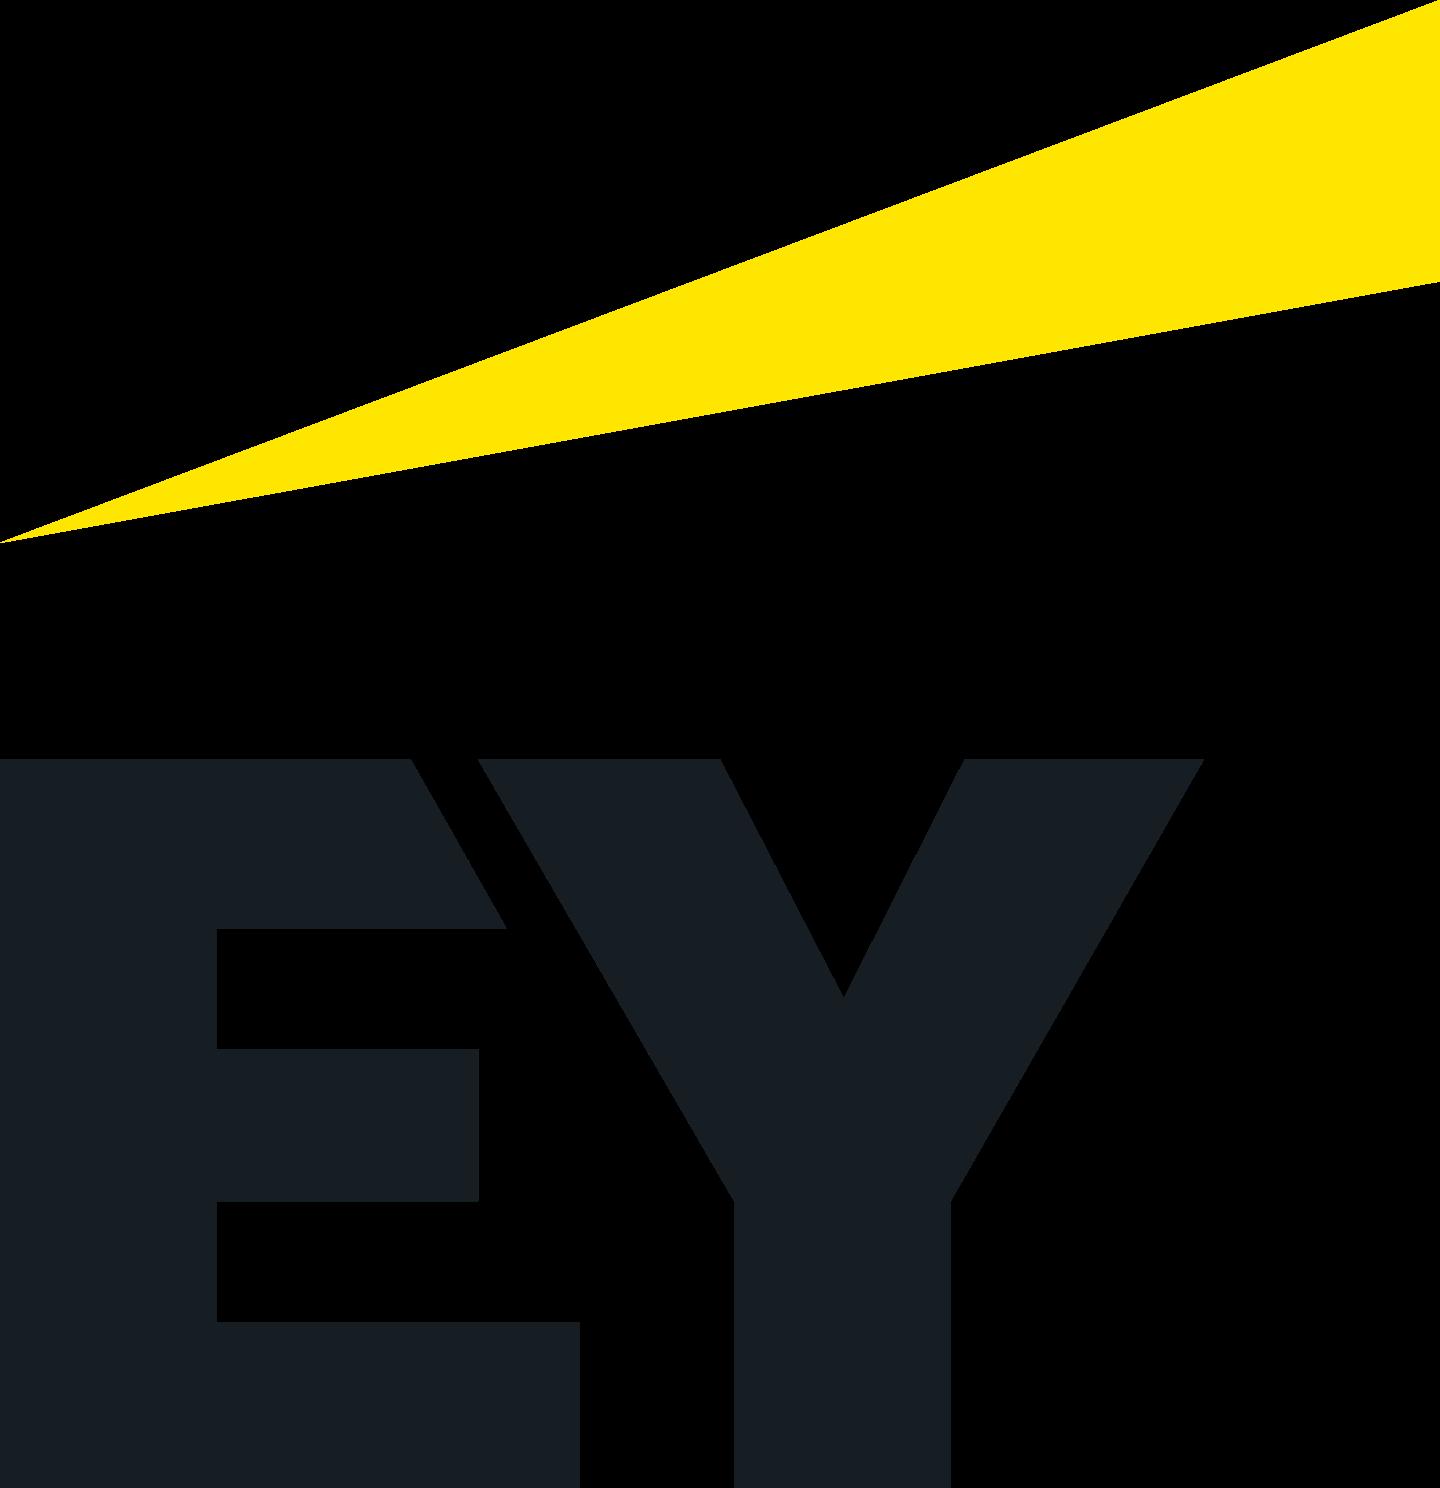 ernst young logo 3 - Ernst & Young Logo